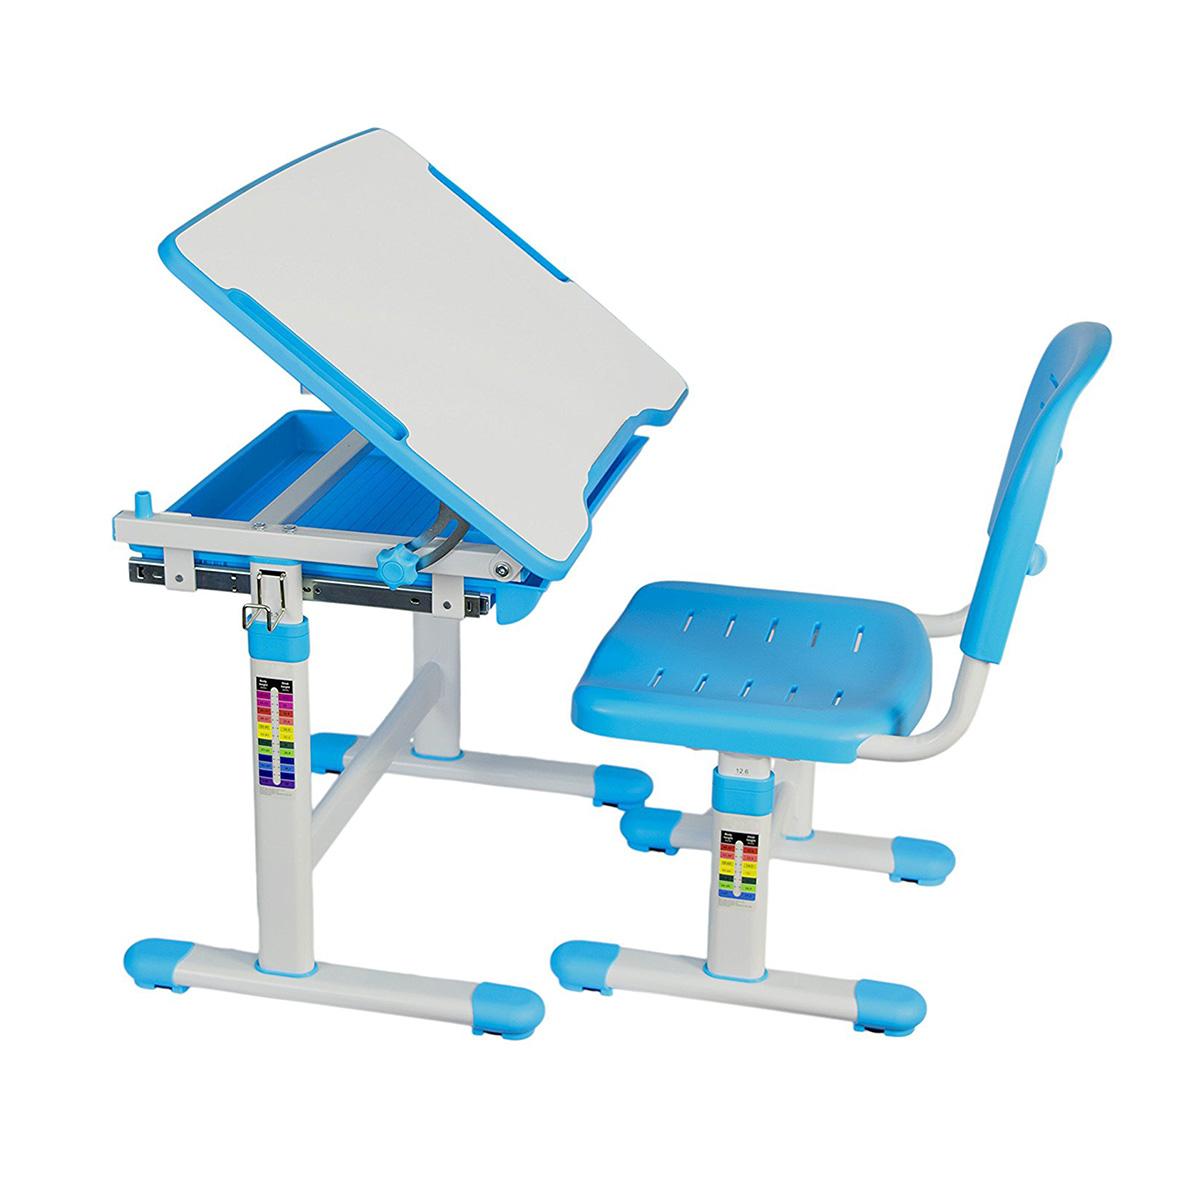 KidzDesk KD26B Ergonomic Height Adjustable Children Desk and Chair Set (Blue)